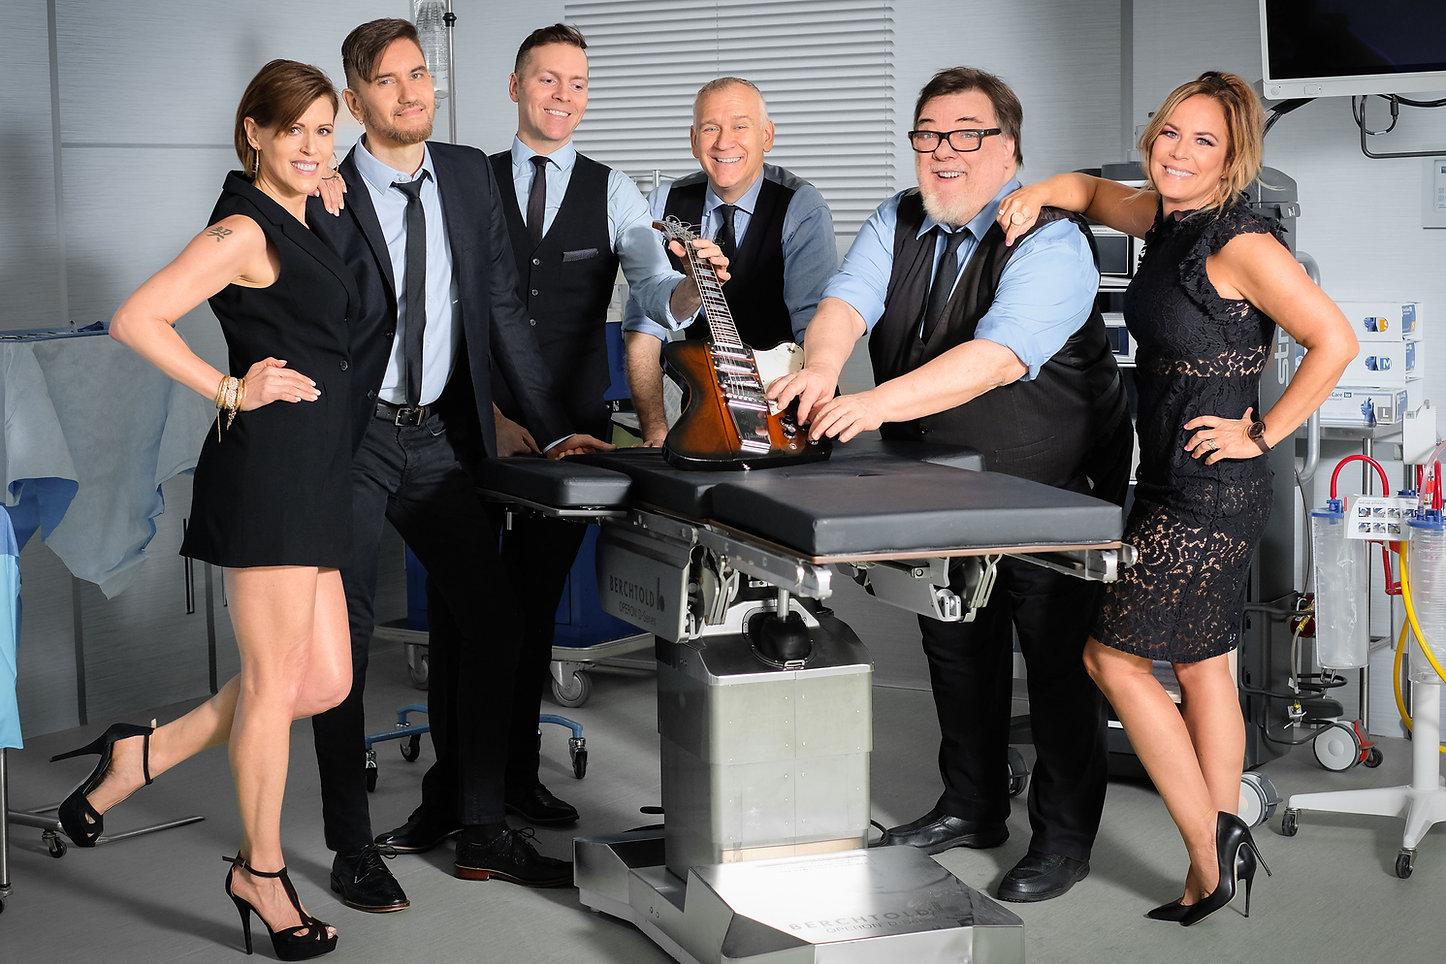 Dr Strangelove Band